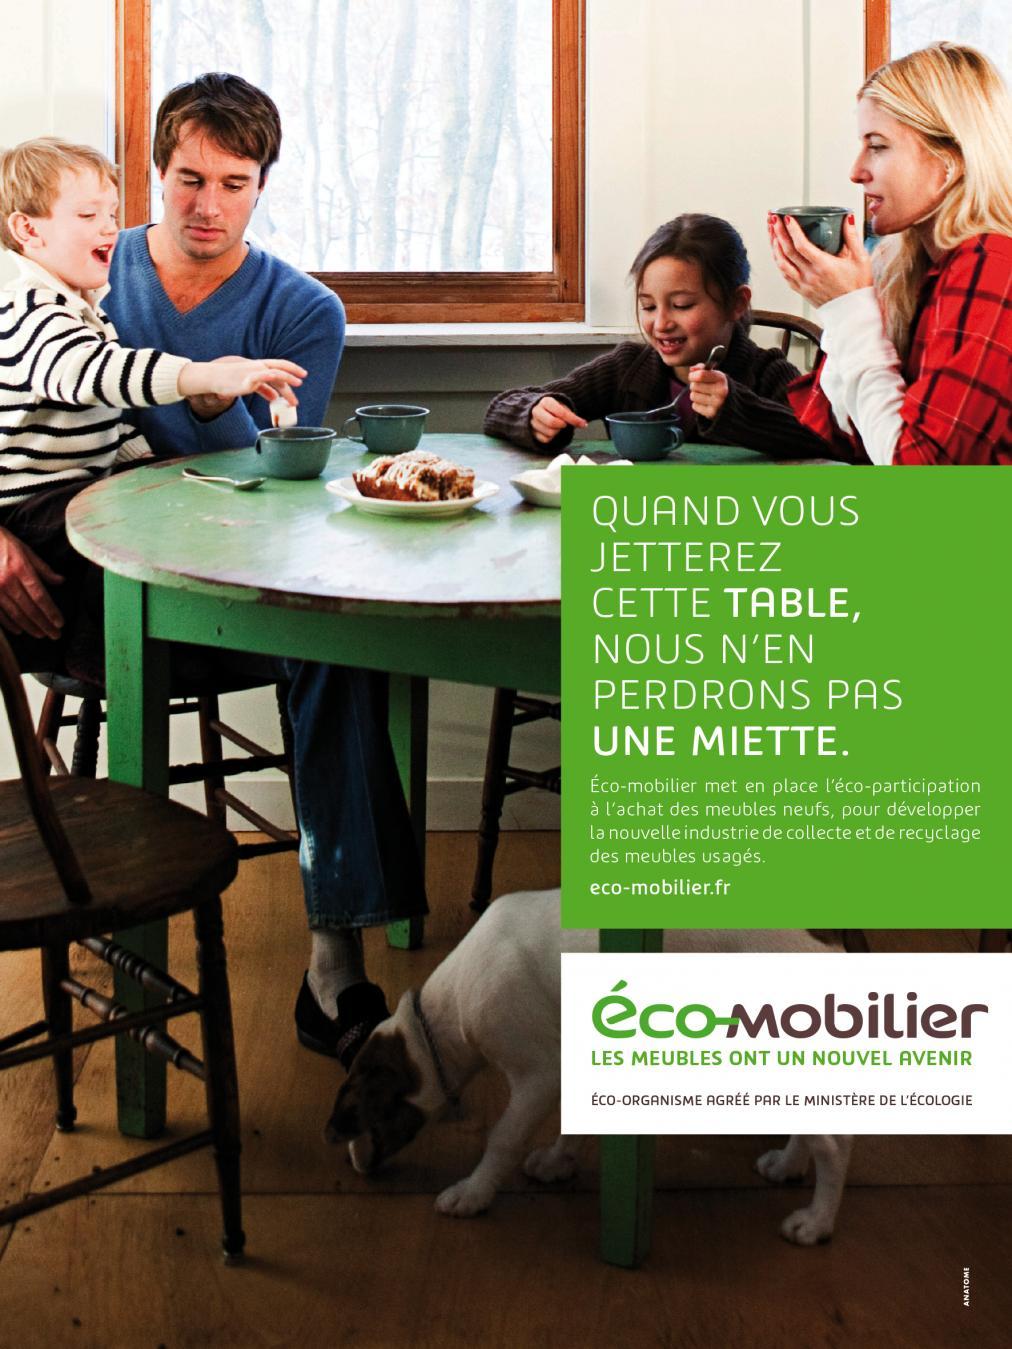 ecomobilier_affiches3